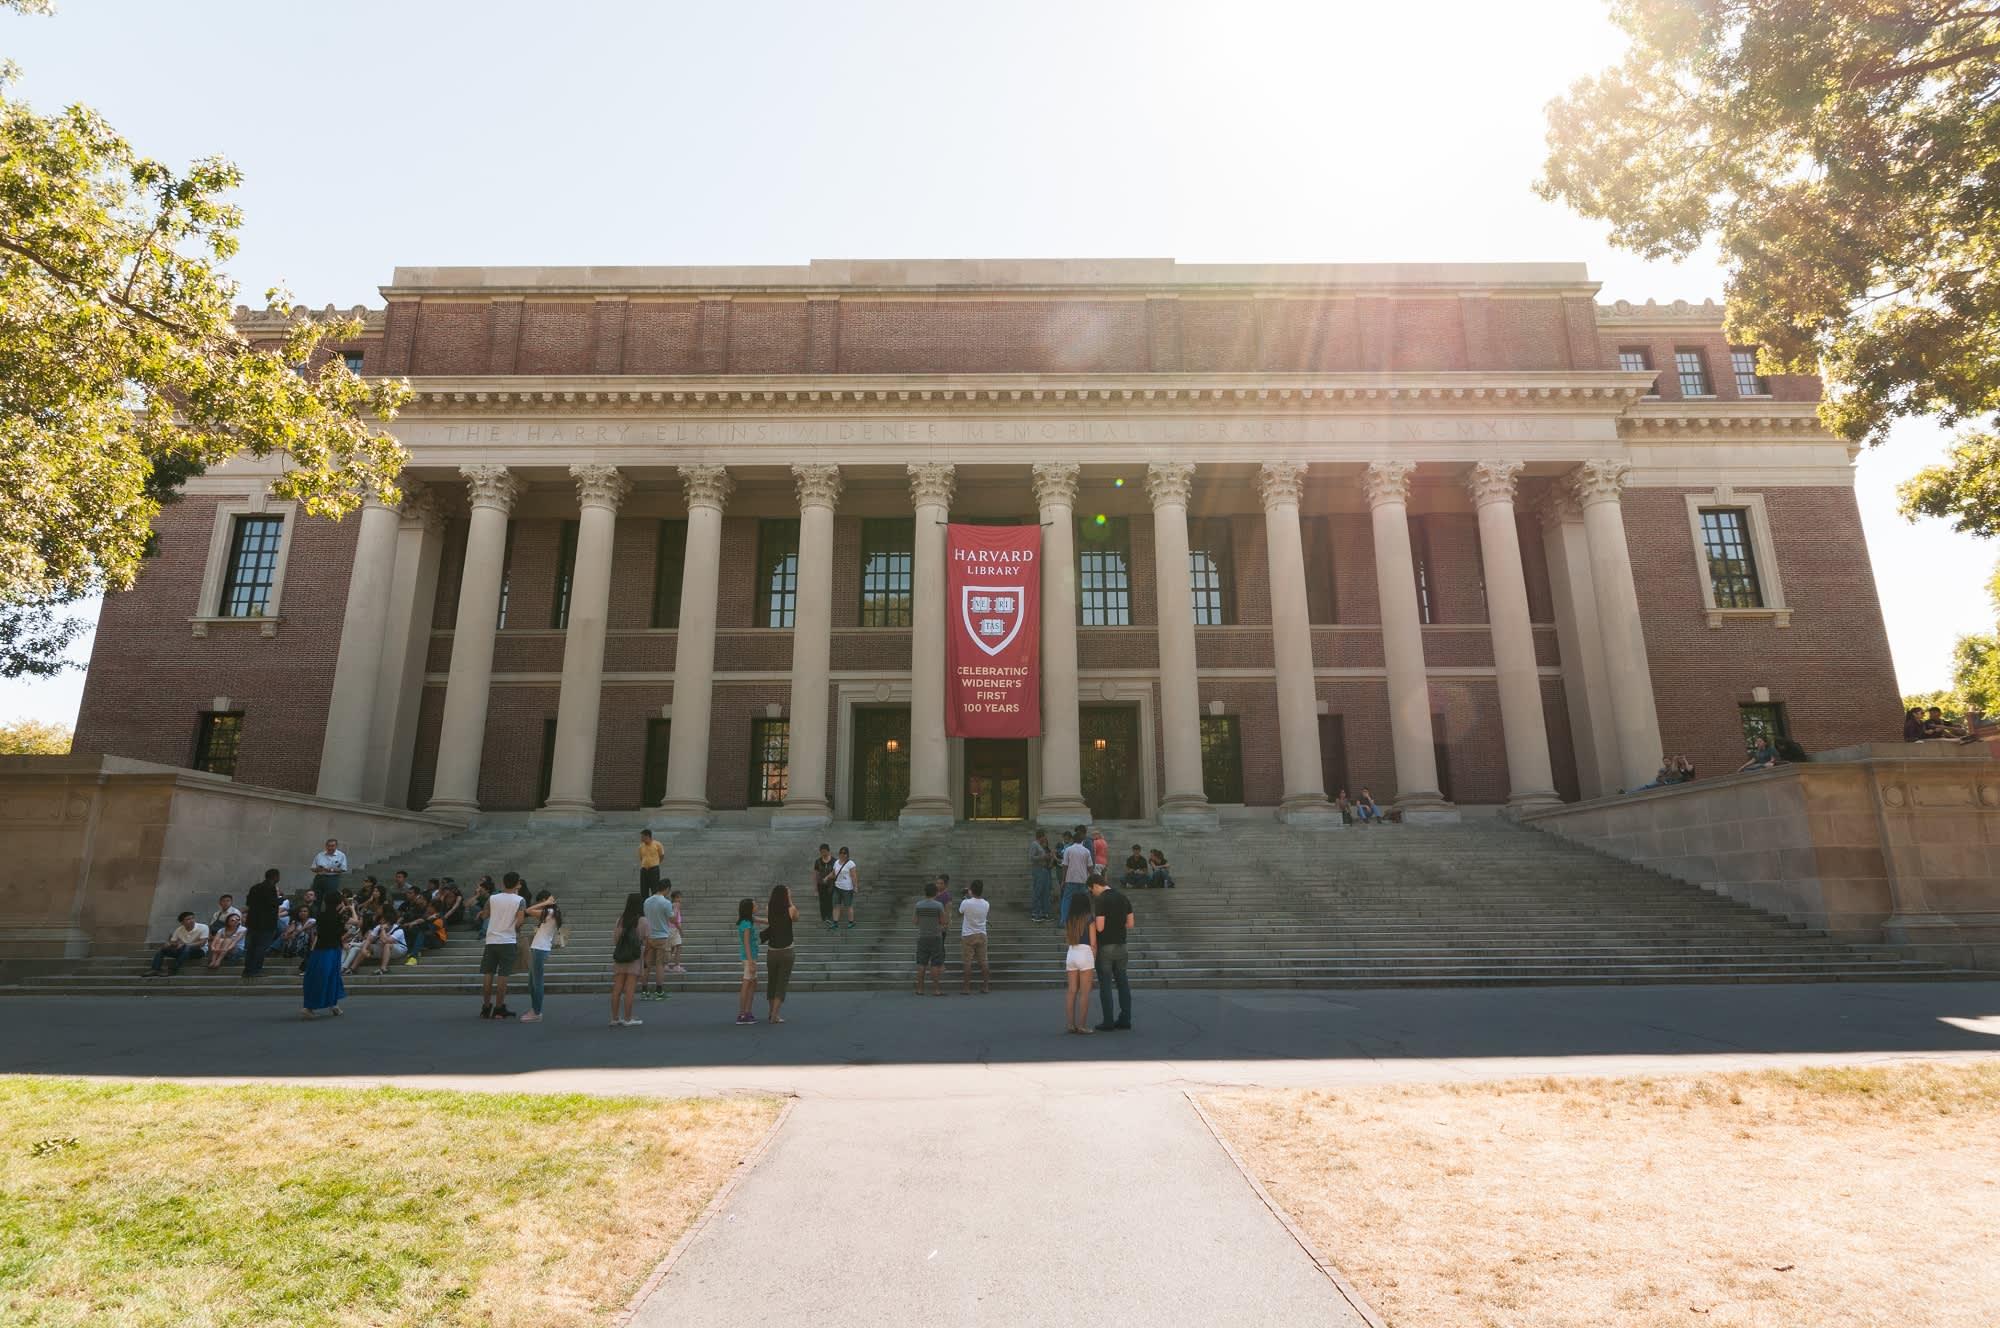 Harvard moves classes online, tells students don't return after spring break